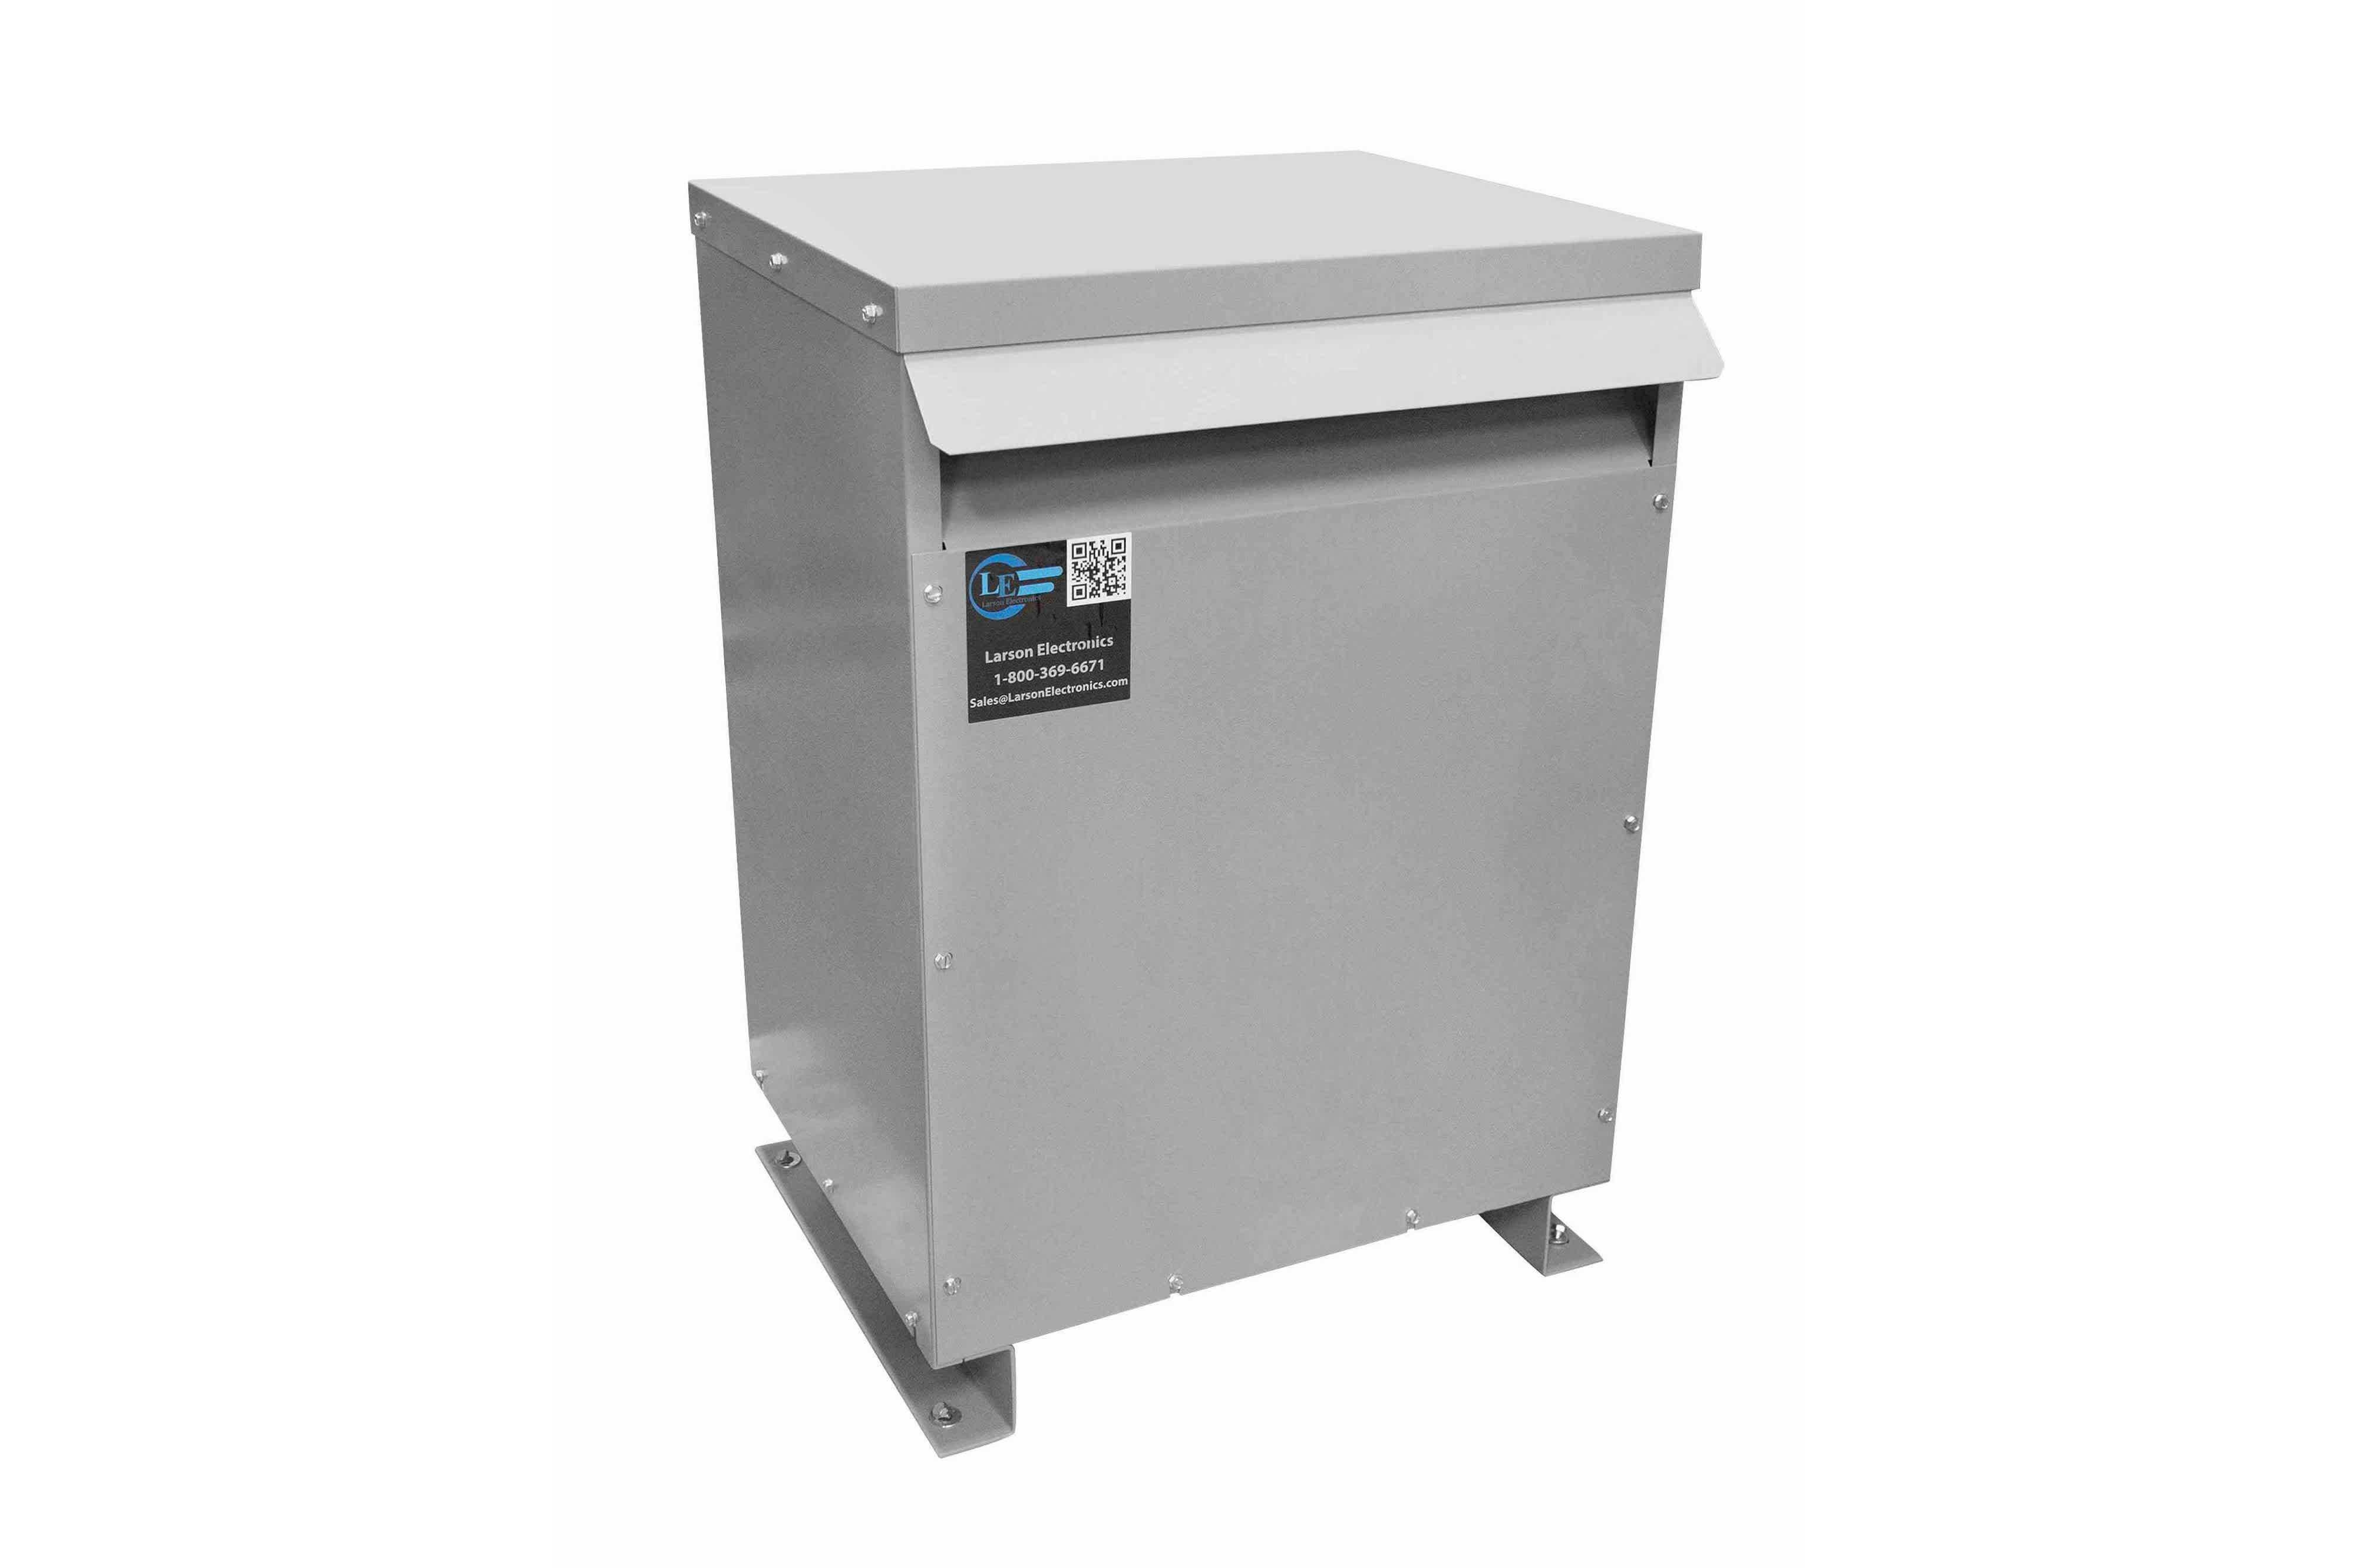 237.5 kVA 3PH Isolation Transformer, 208V Wye Primary, 600V Delta Secondary, N3R, Ventilated, 60 Hz